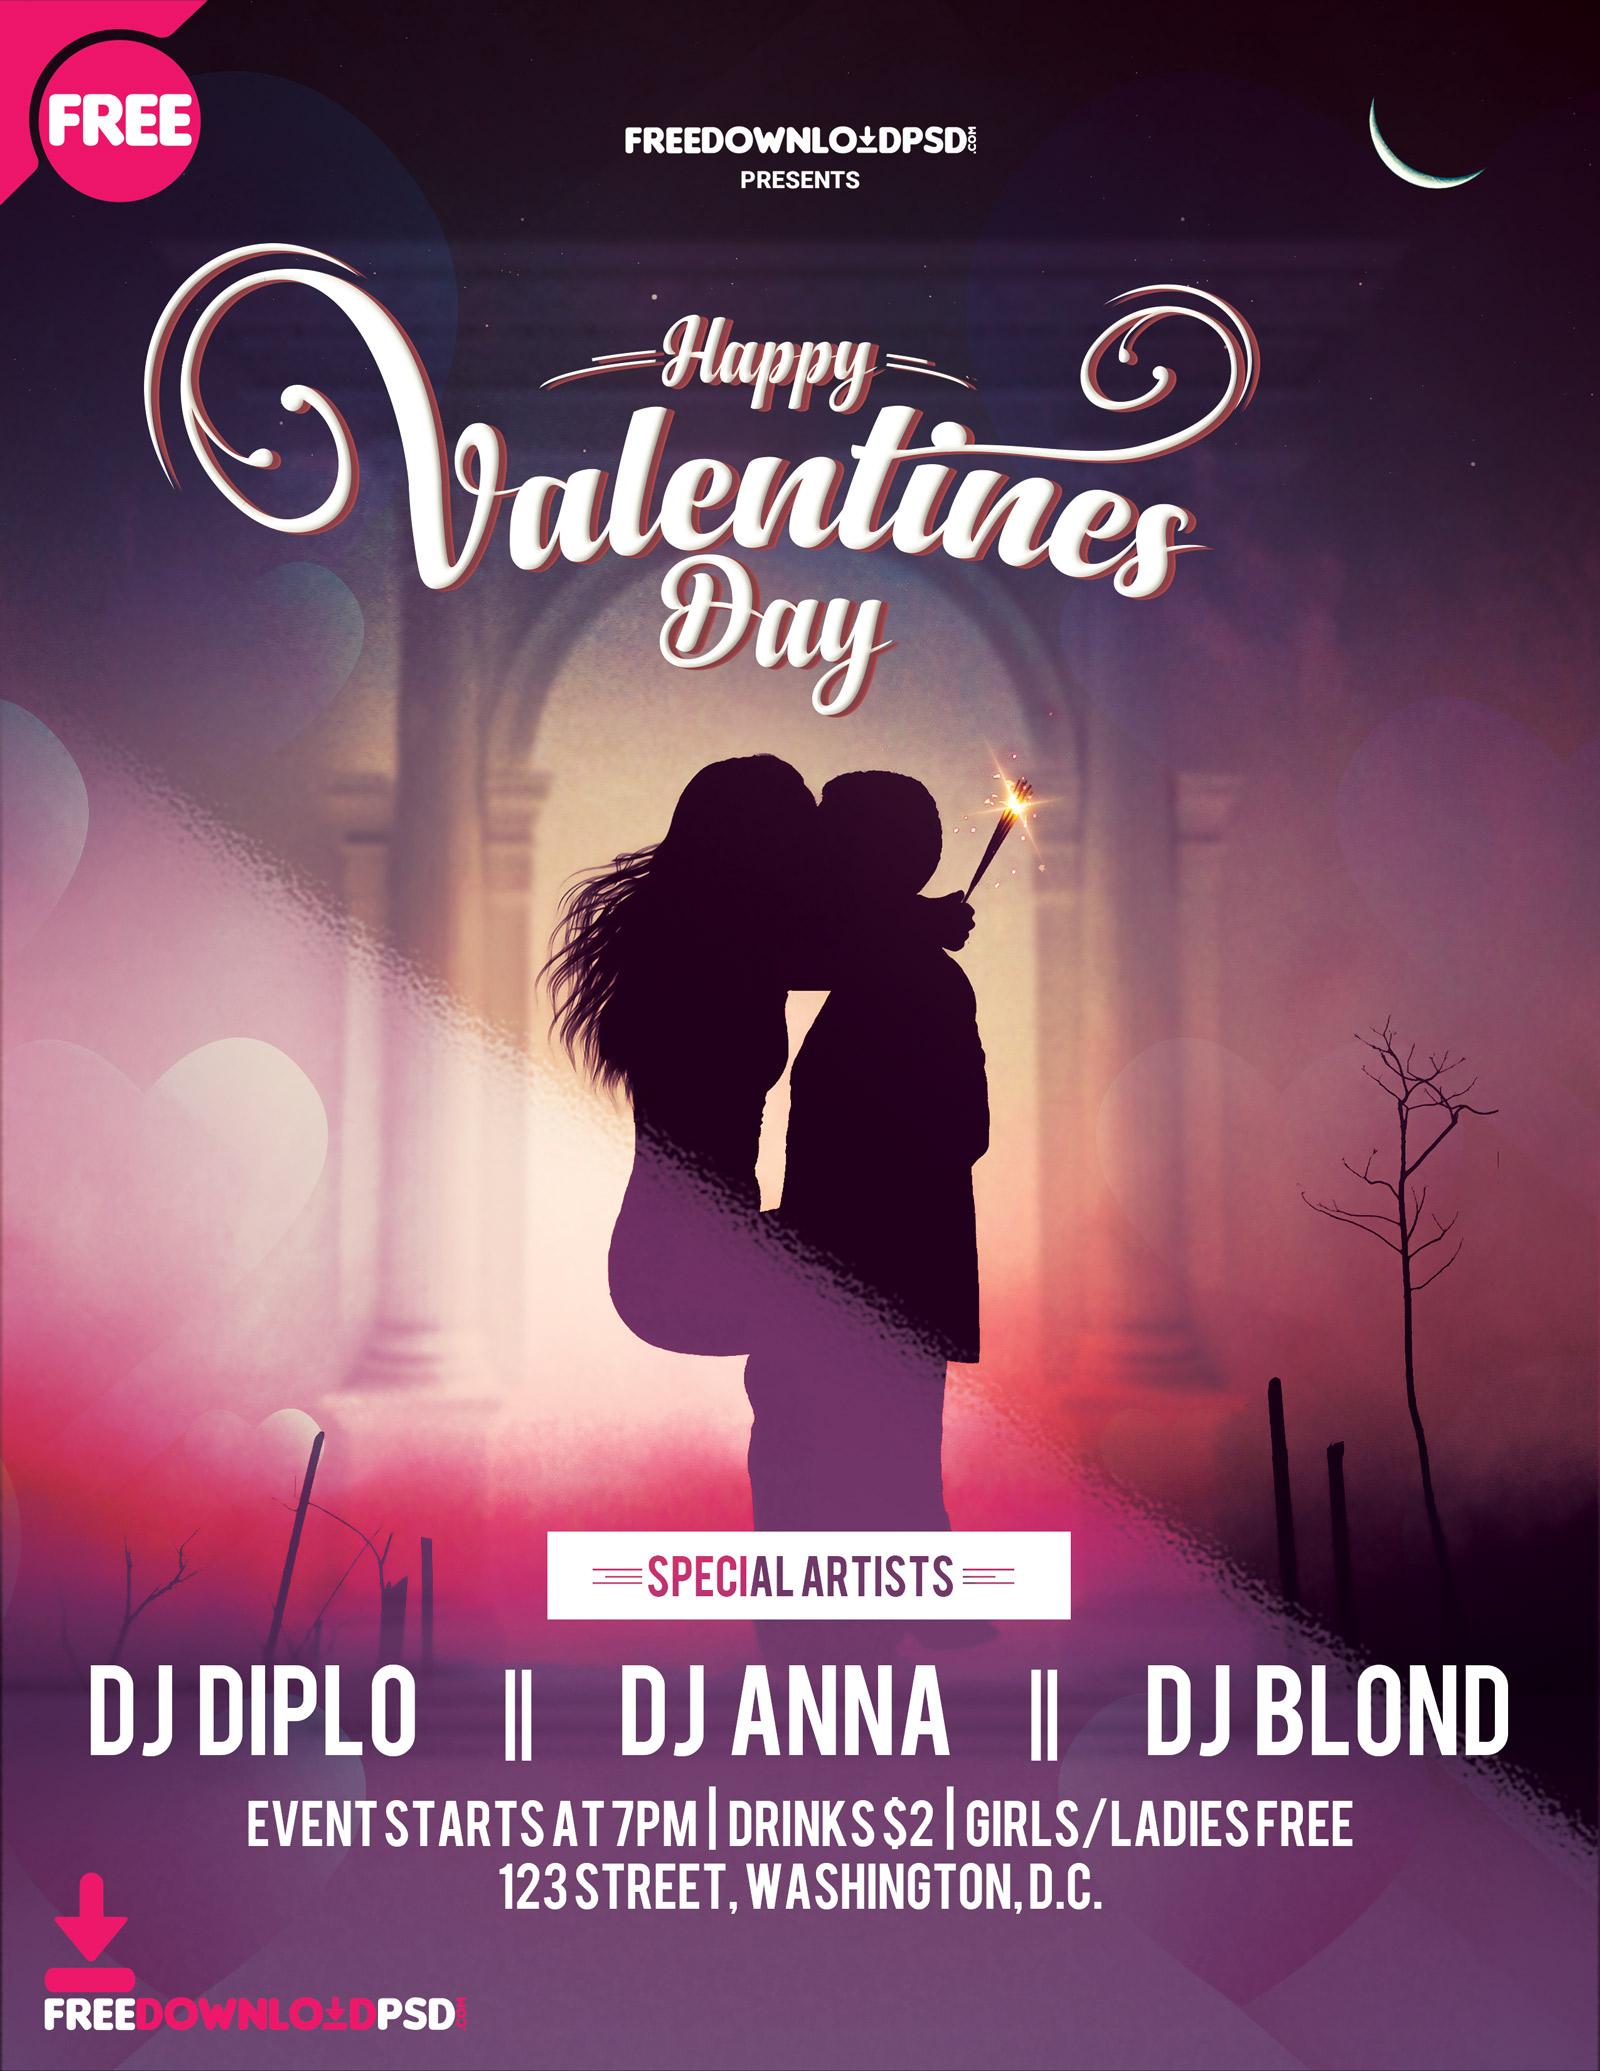 http://freedownloadpsd.com/wp-content/uploads/2018/01/Valentines-Day-Flyer-Template.jpg